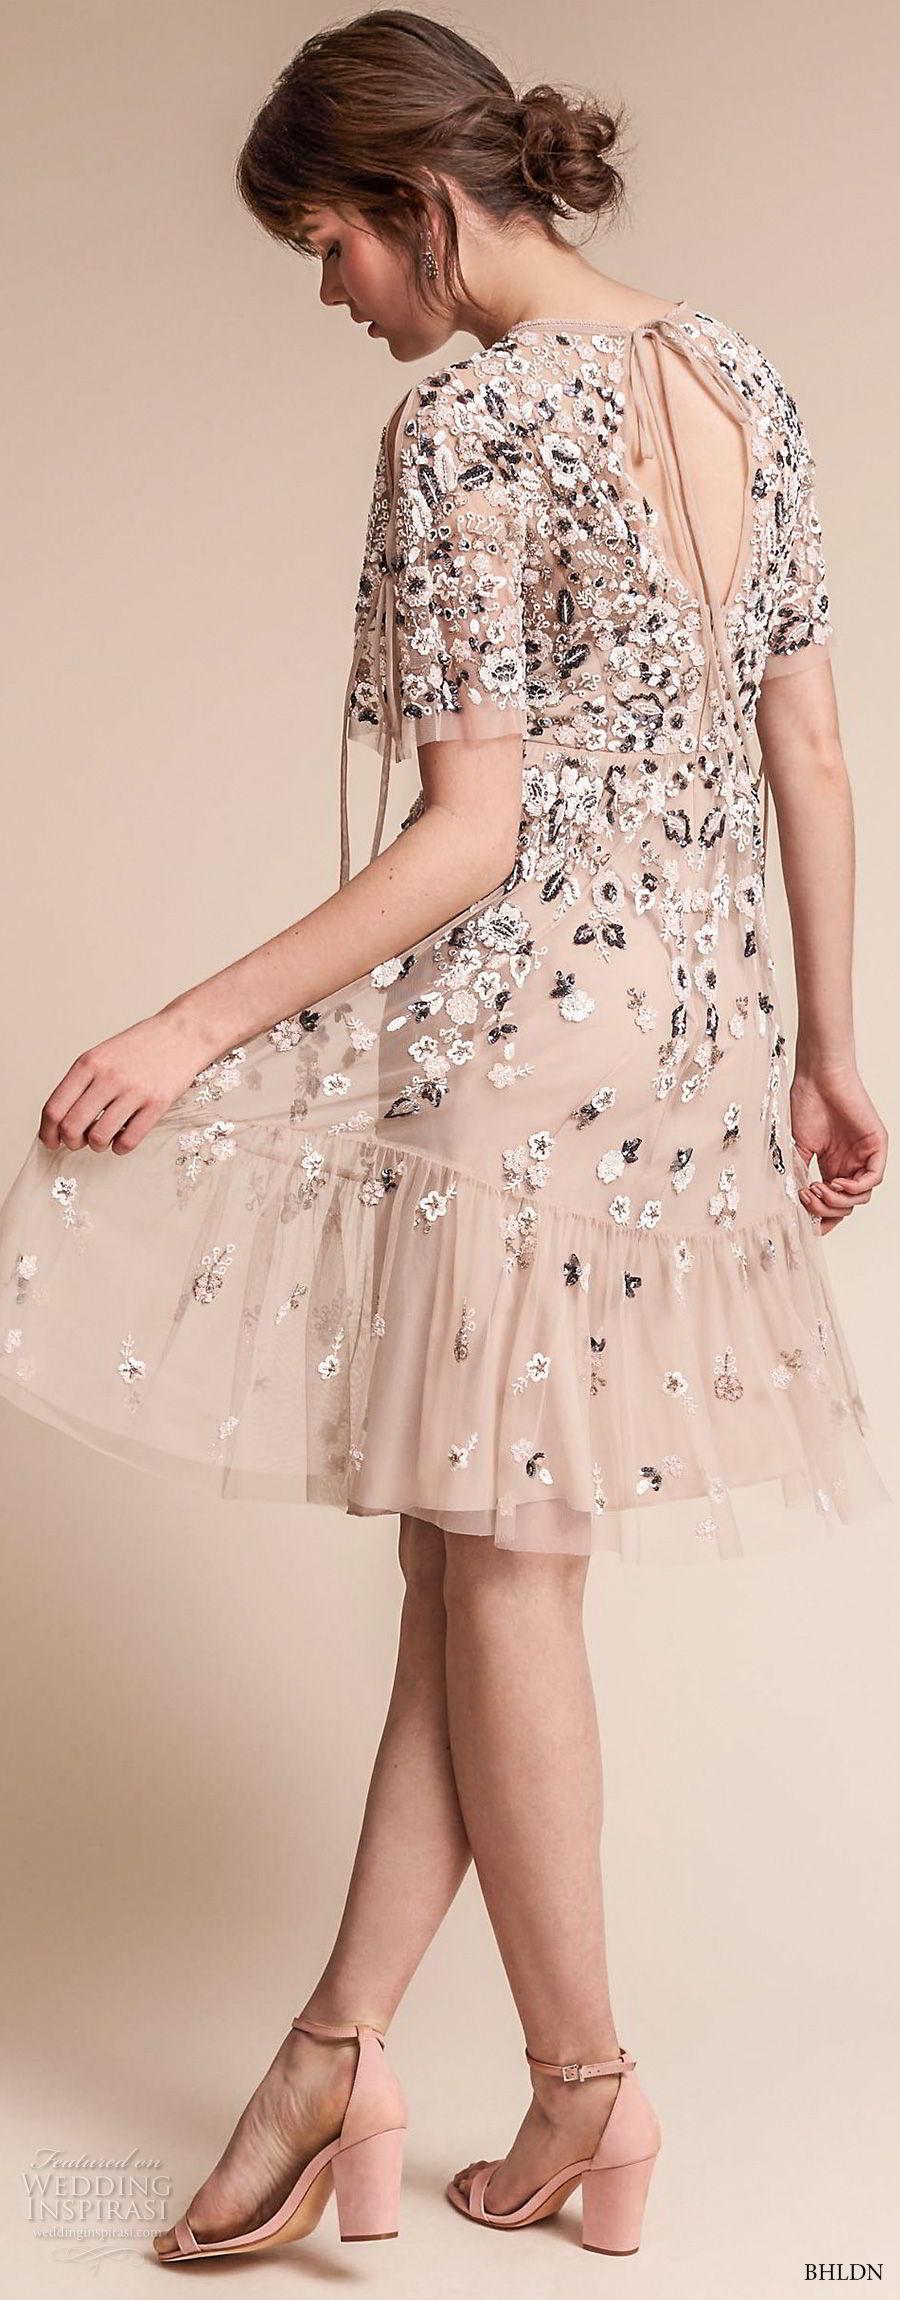 bhldn fall 2017  americana bridal short sleeves jewel neck full embellishment romantic pretty creme color above knee short wedding dress keyhole back (majorca) bv